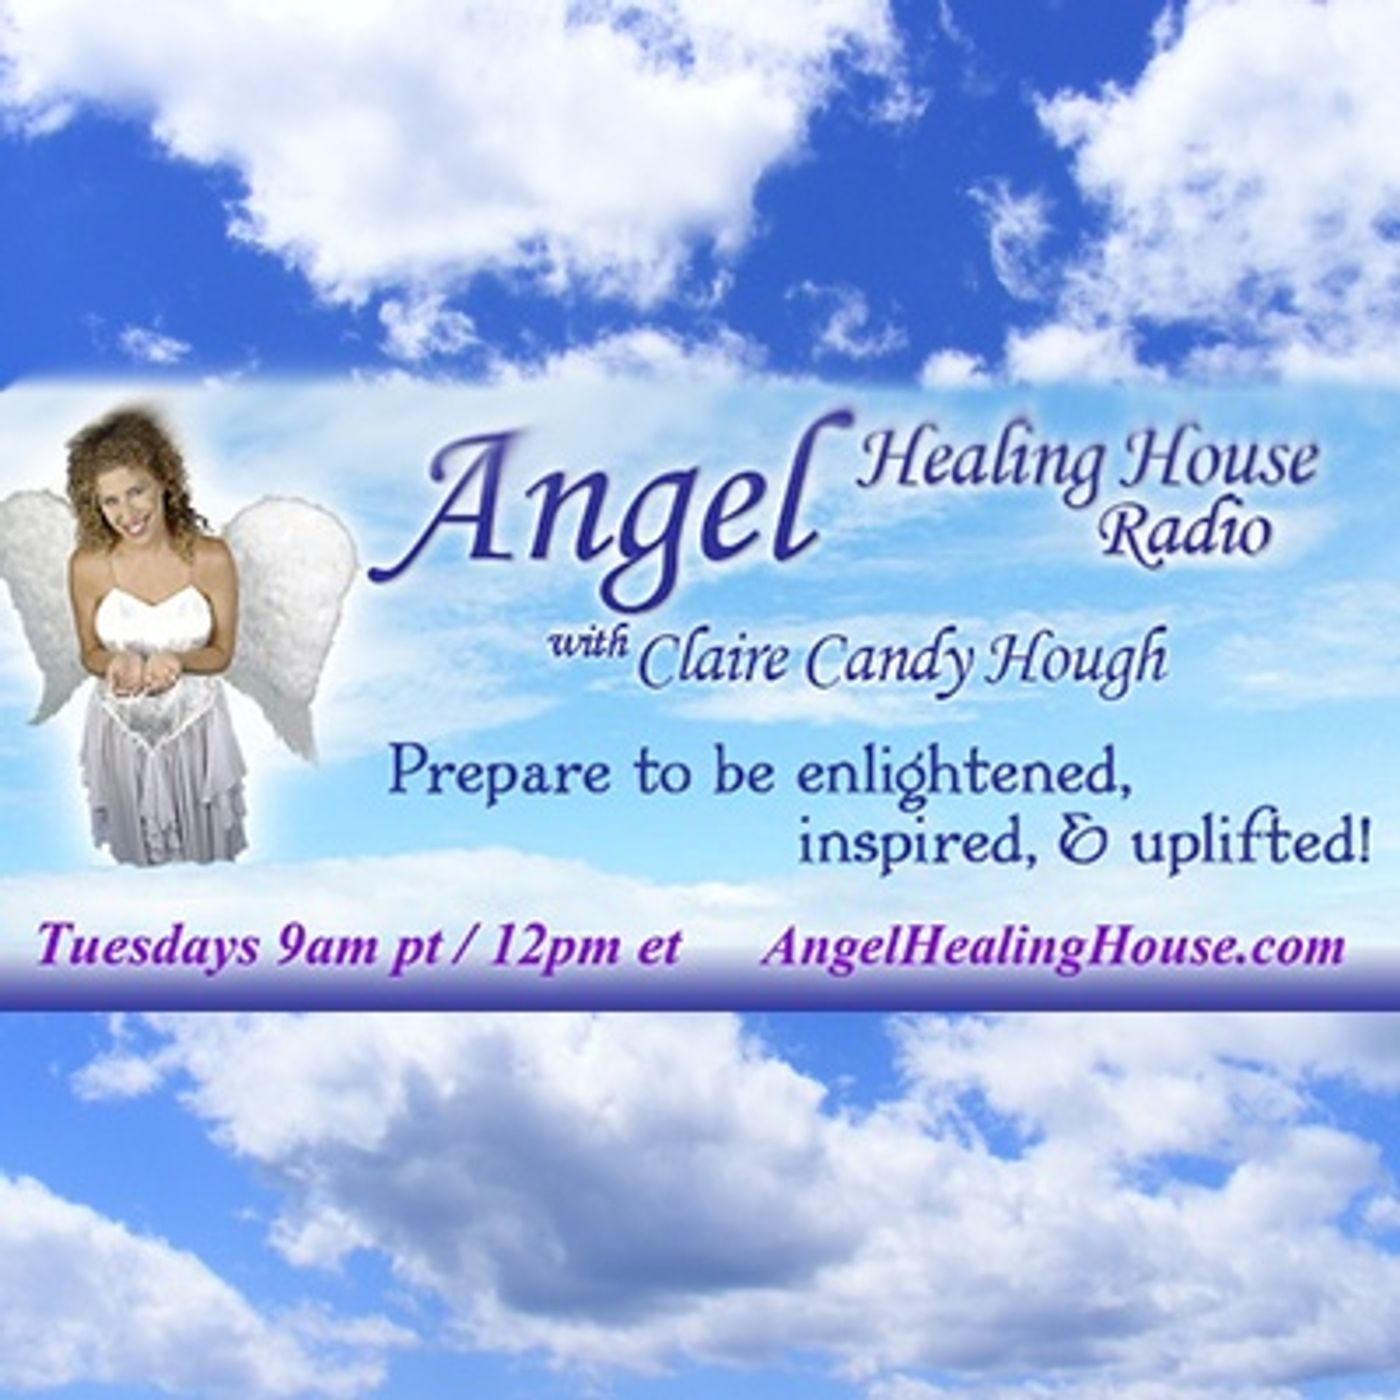 Angel Healing House Radio